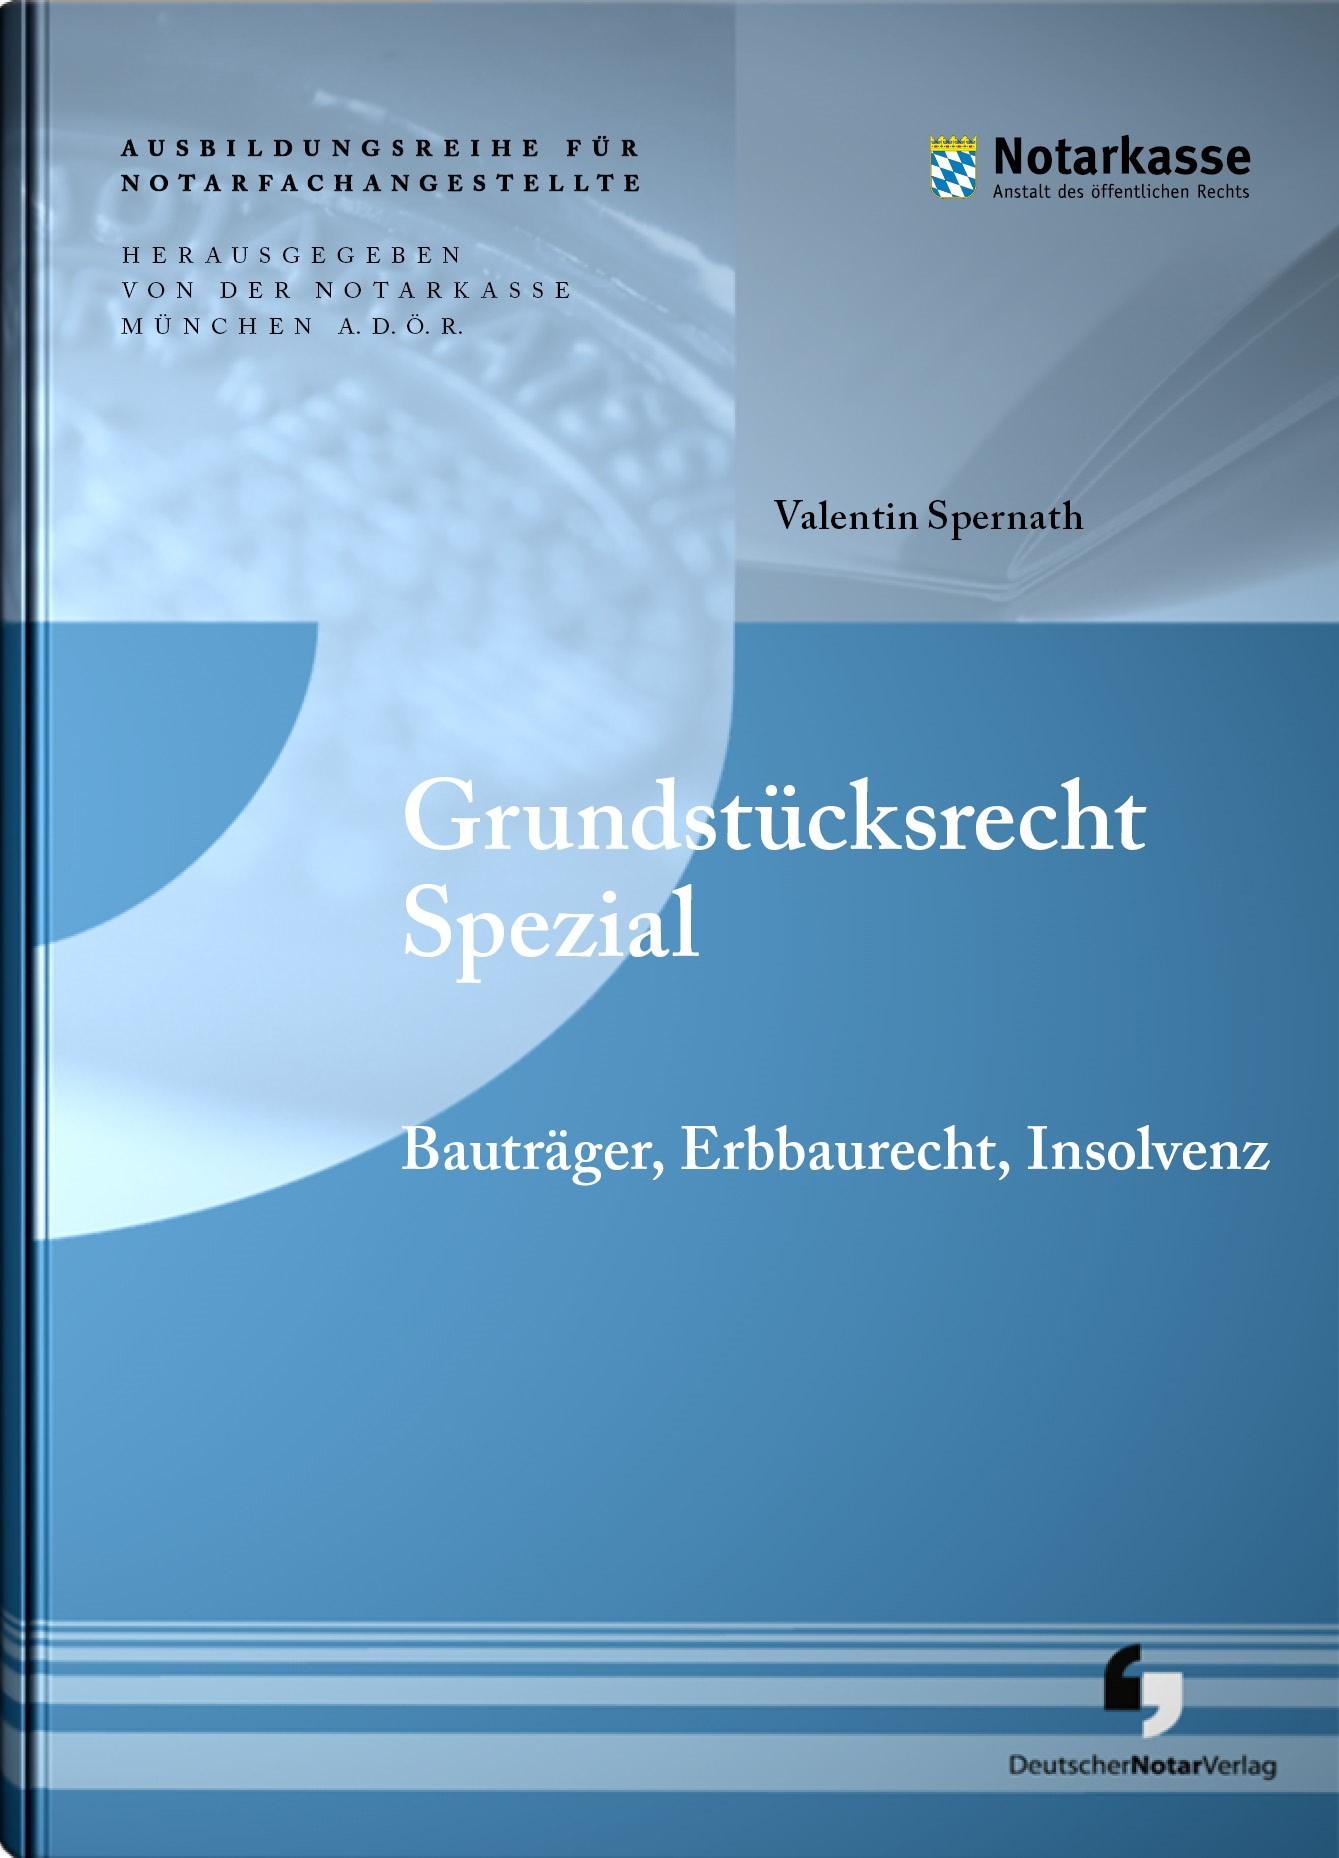 Abbildung von A. D. Ö. R., Notarkasse München / Spernath (Hrsg.) | Grundstücksrecht Spezial | 2019